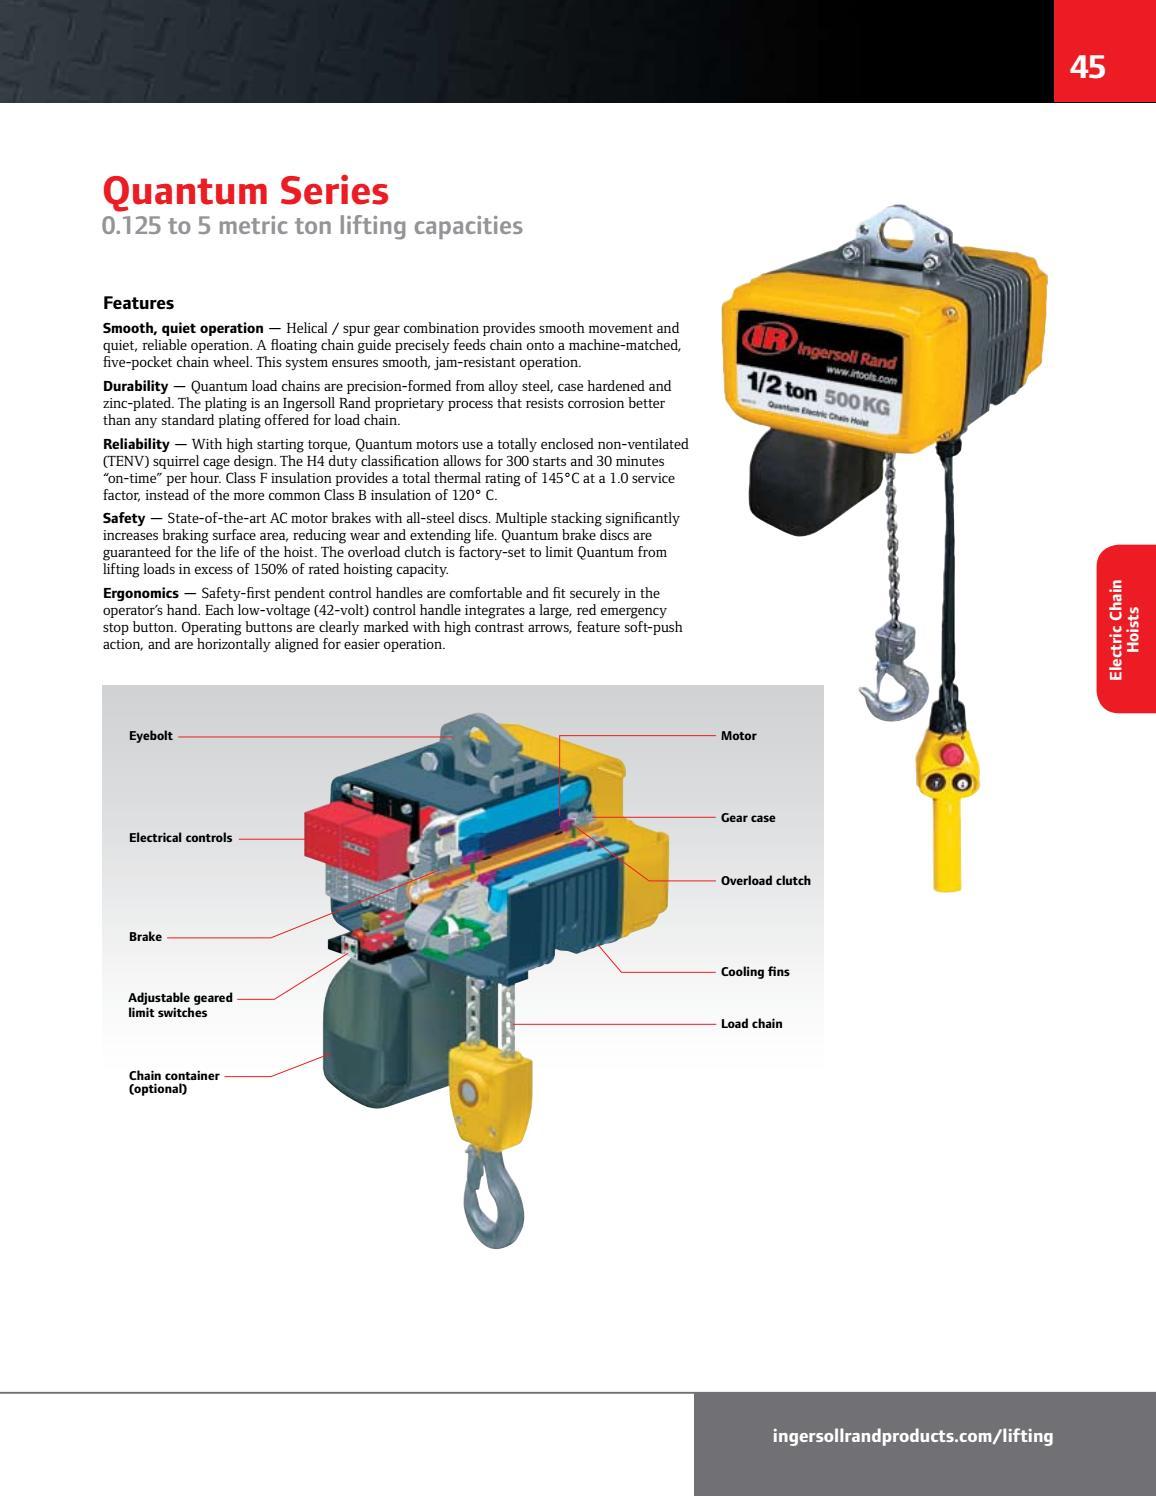 Polipastos Elctricos Ingersoll Rand 0 125 A 5 Toneladas Quantum By Hoist Limit Switch Wiring Diagram Gear Almacenes Jj Sa Issuu